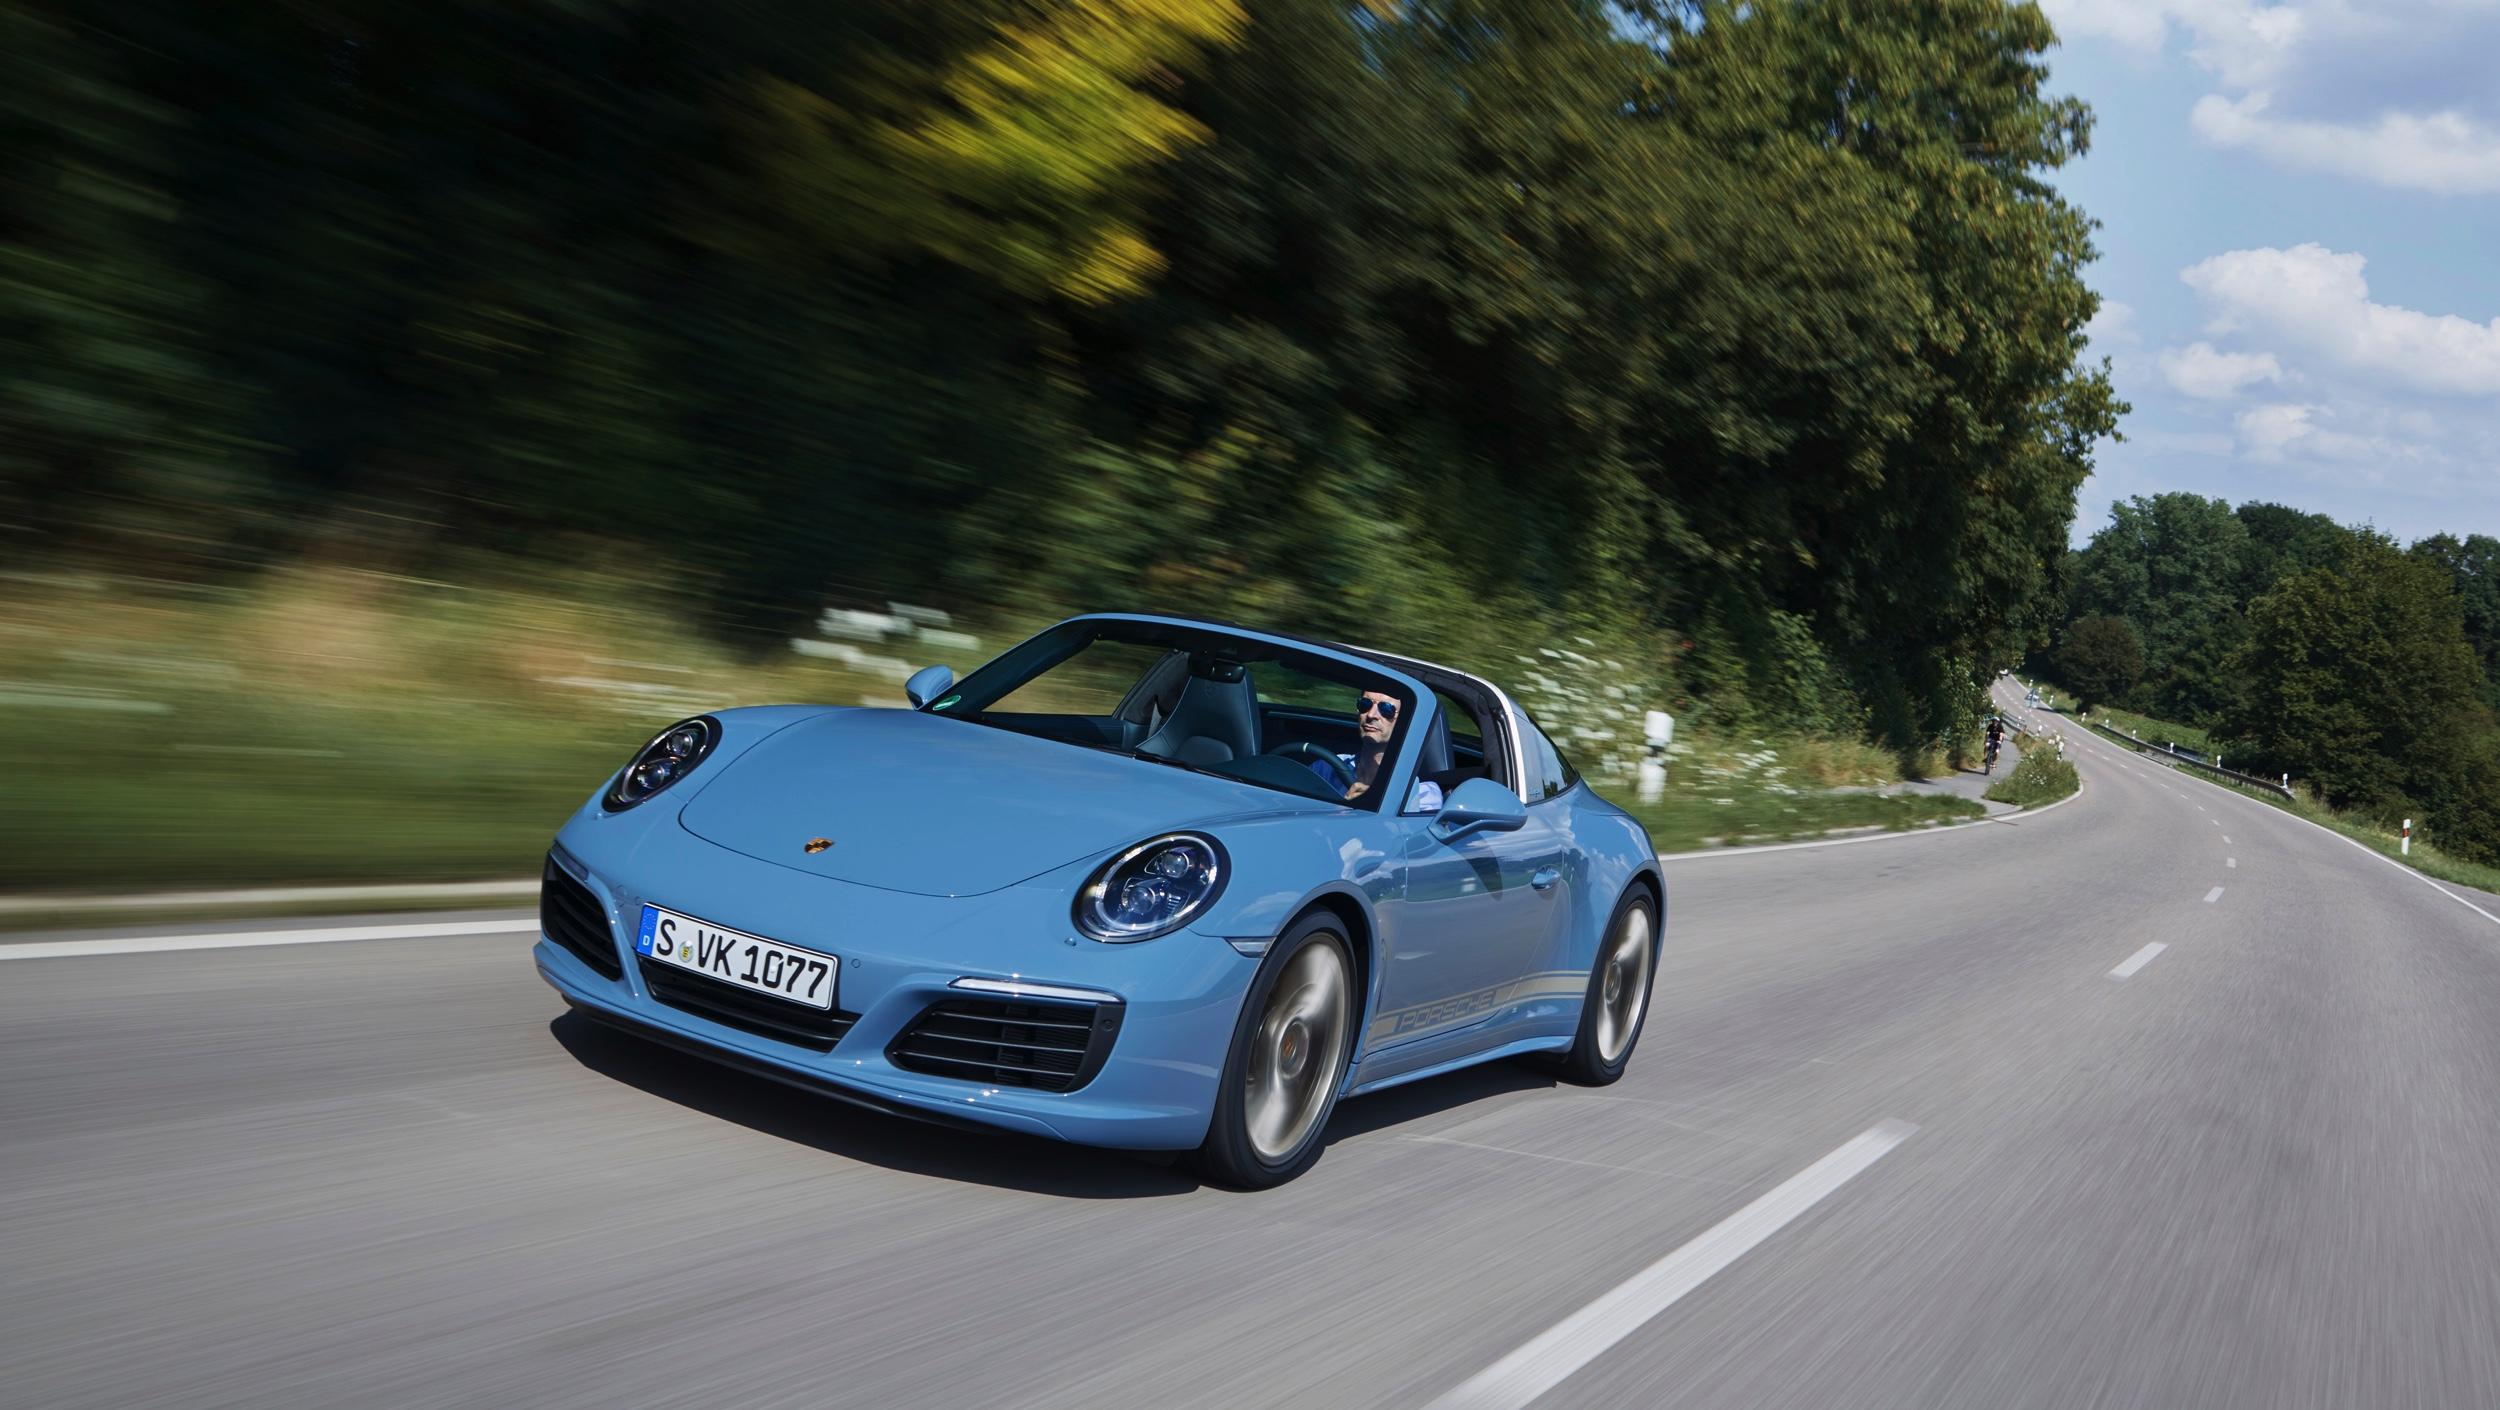 Porsche 911 Targa 4S Exclusive Design Edition -4- Autovisie.nl